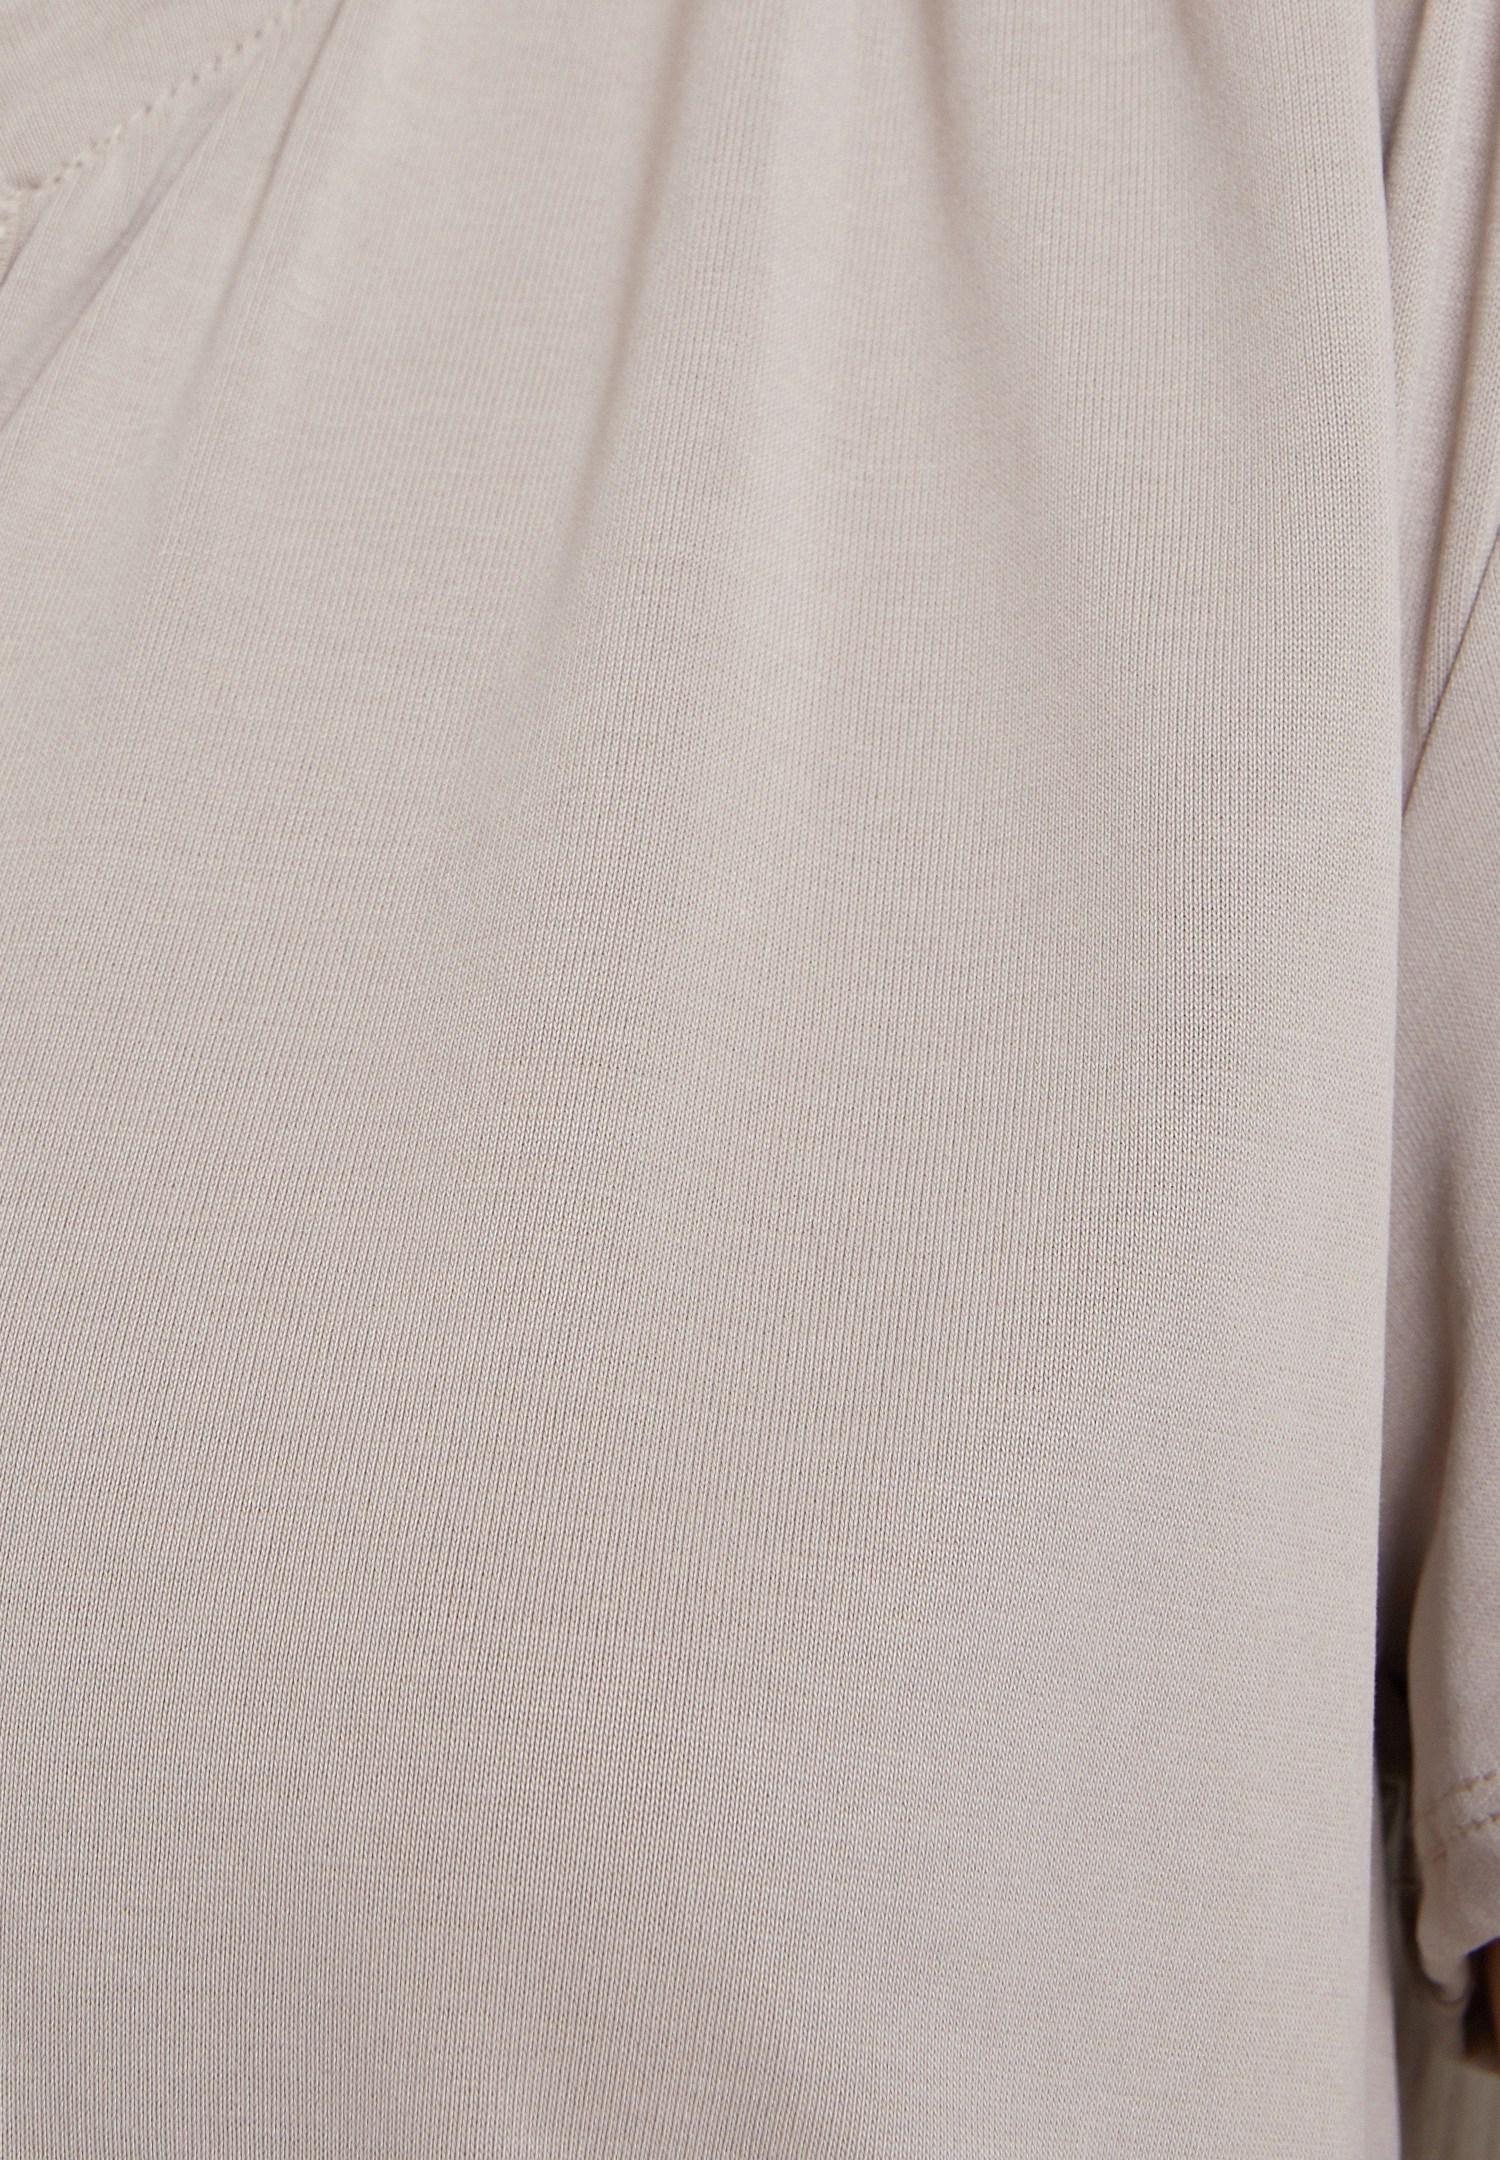 Bayan Krem Yumuşak Dokulu V Yaka Bluz